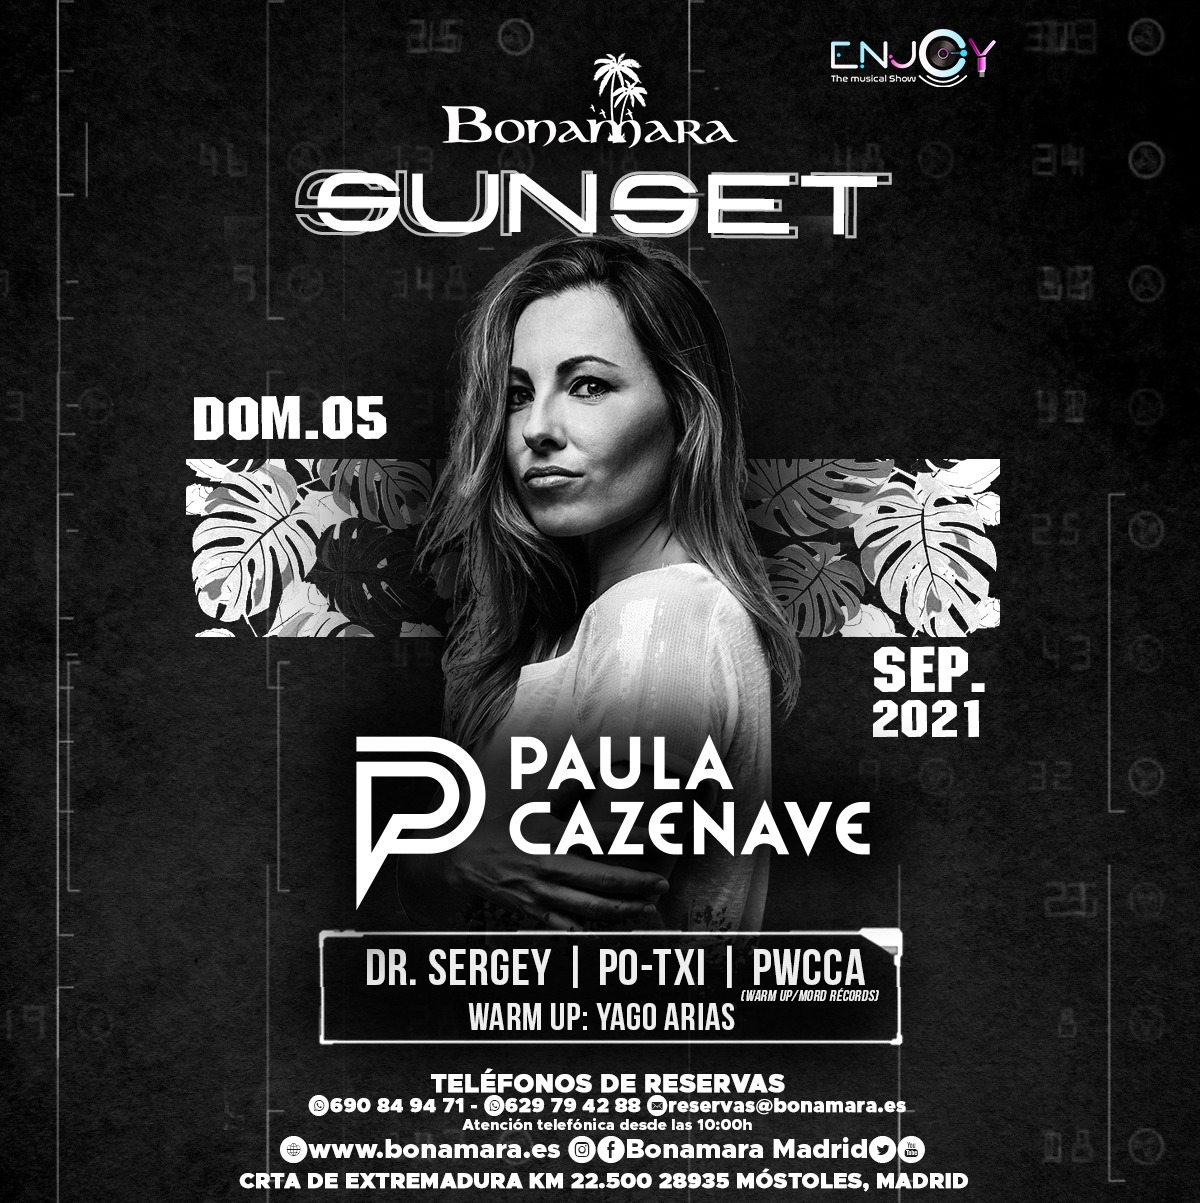 SUNSET ENJOY BONAMARA 05-09-2021 PAULA CAZENAVE